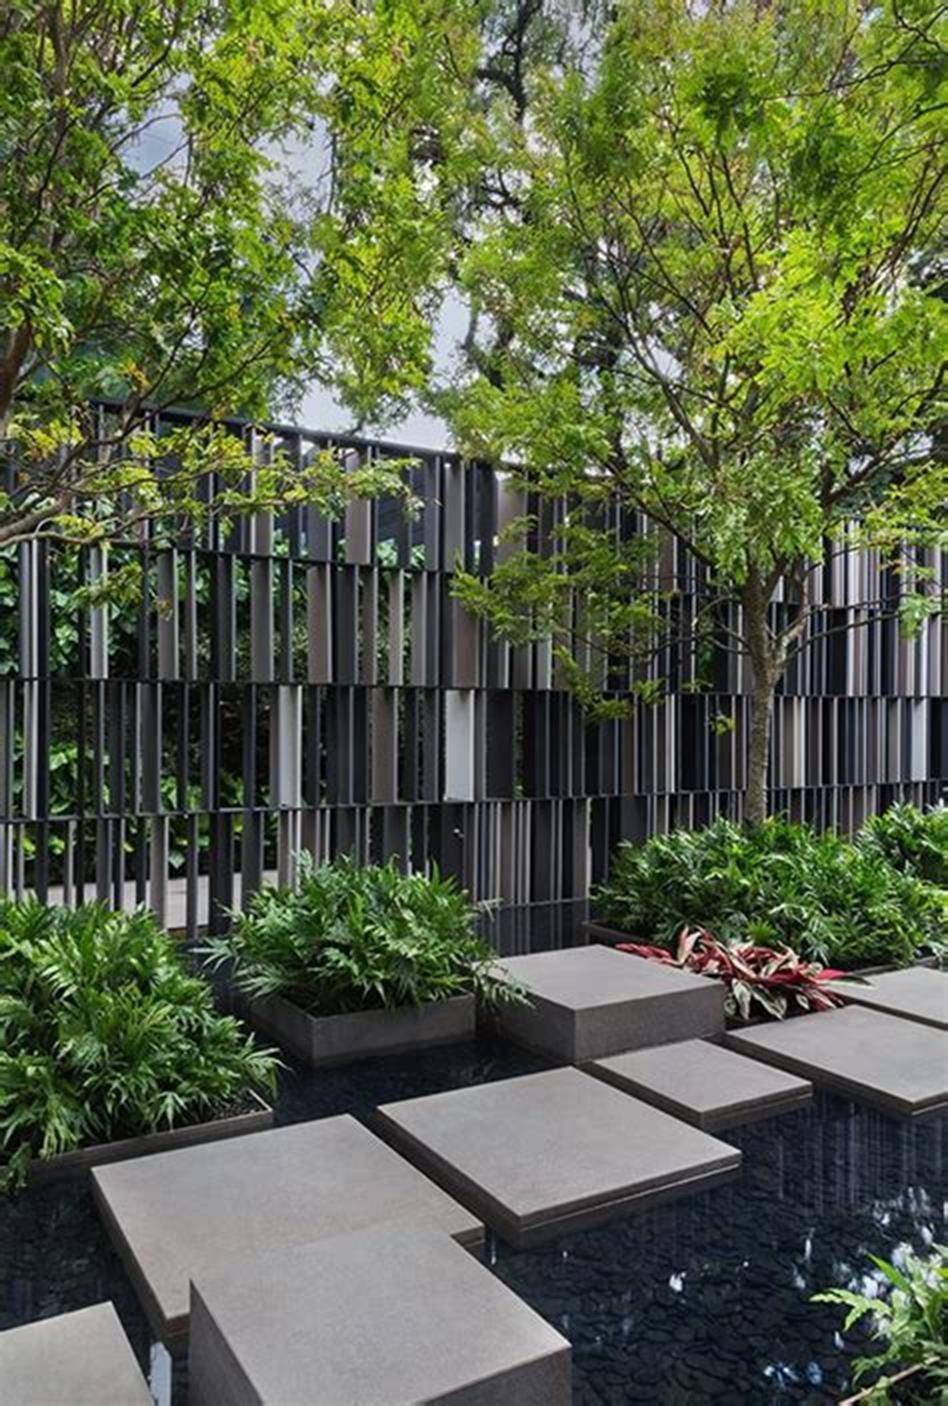 32 Amazing Contemporary Backyard Ideas To Inspire You Landscape